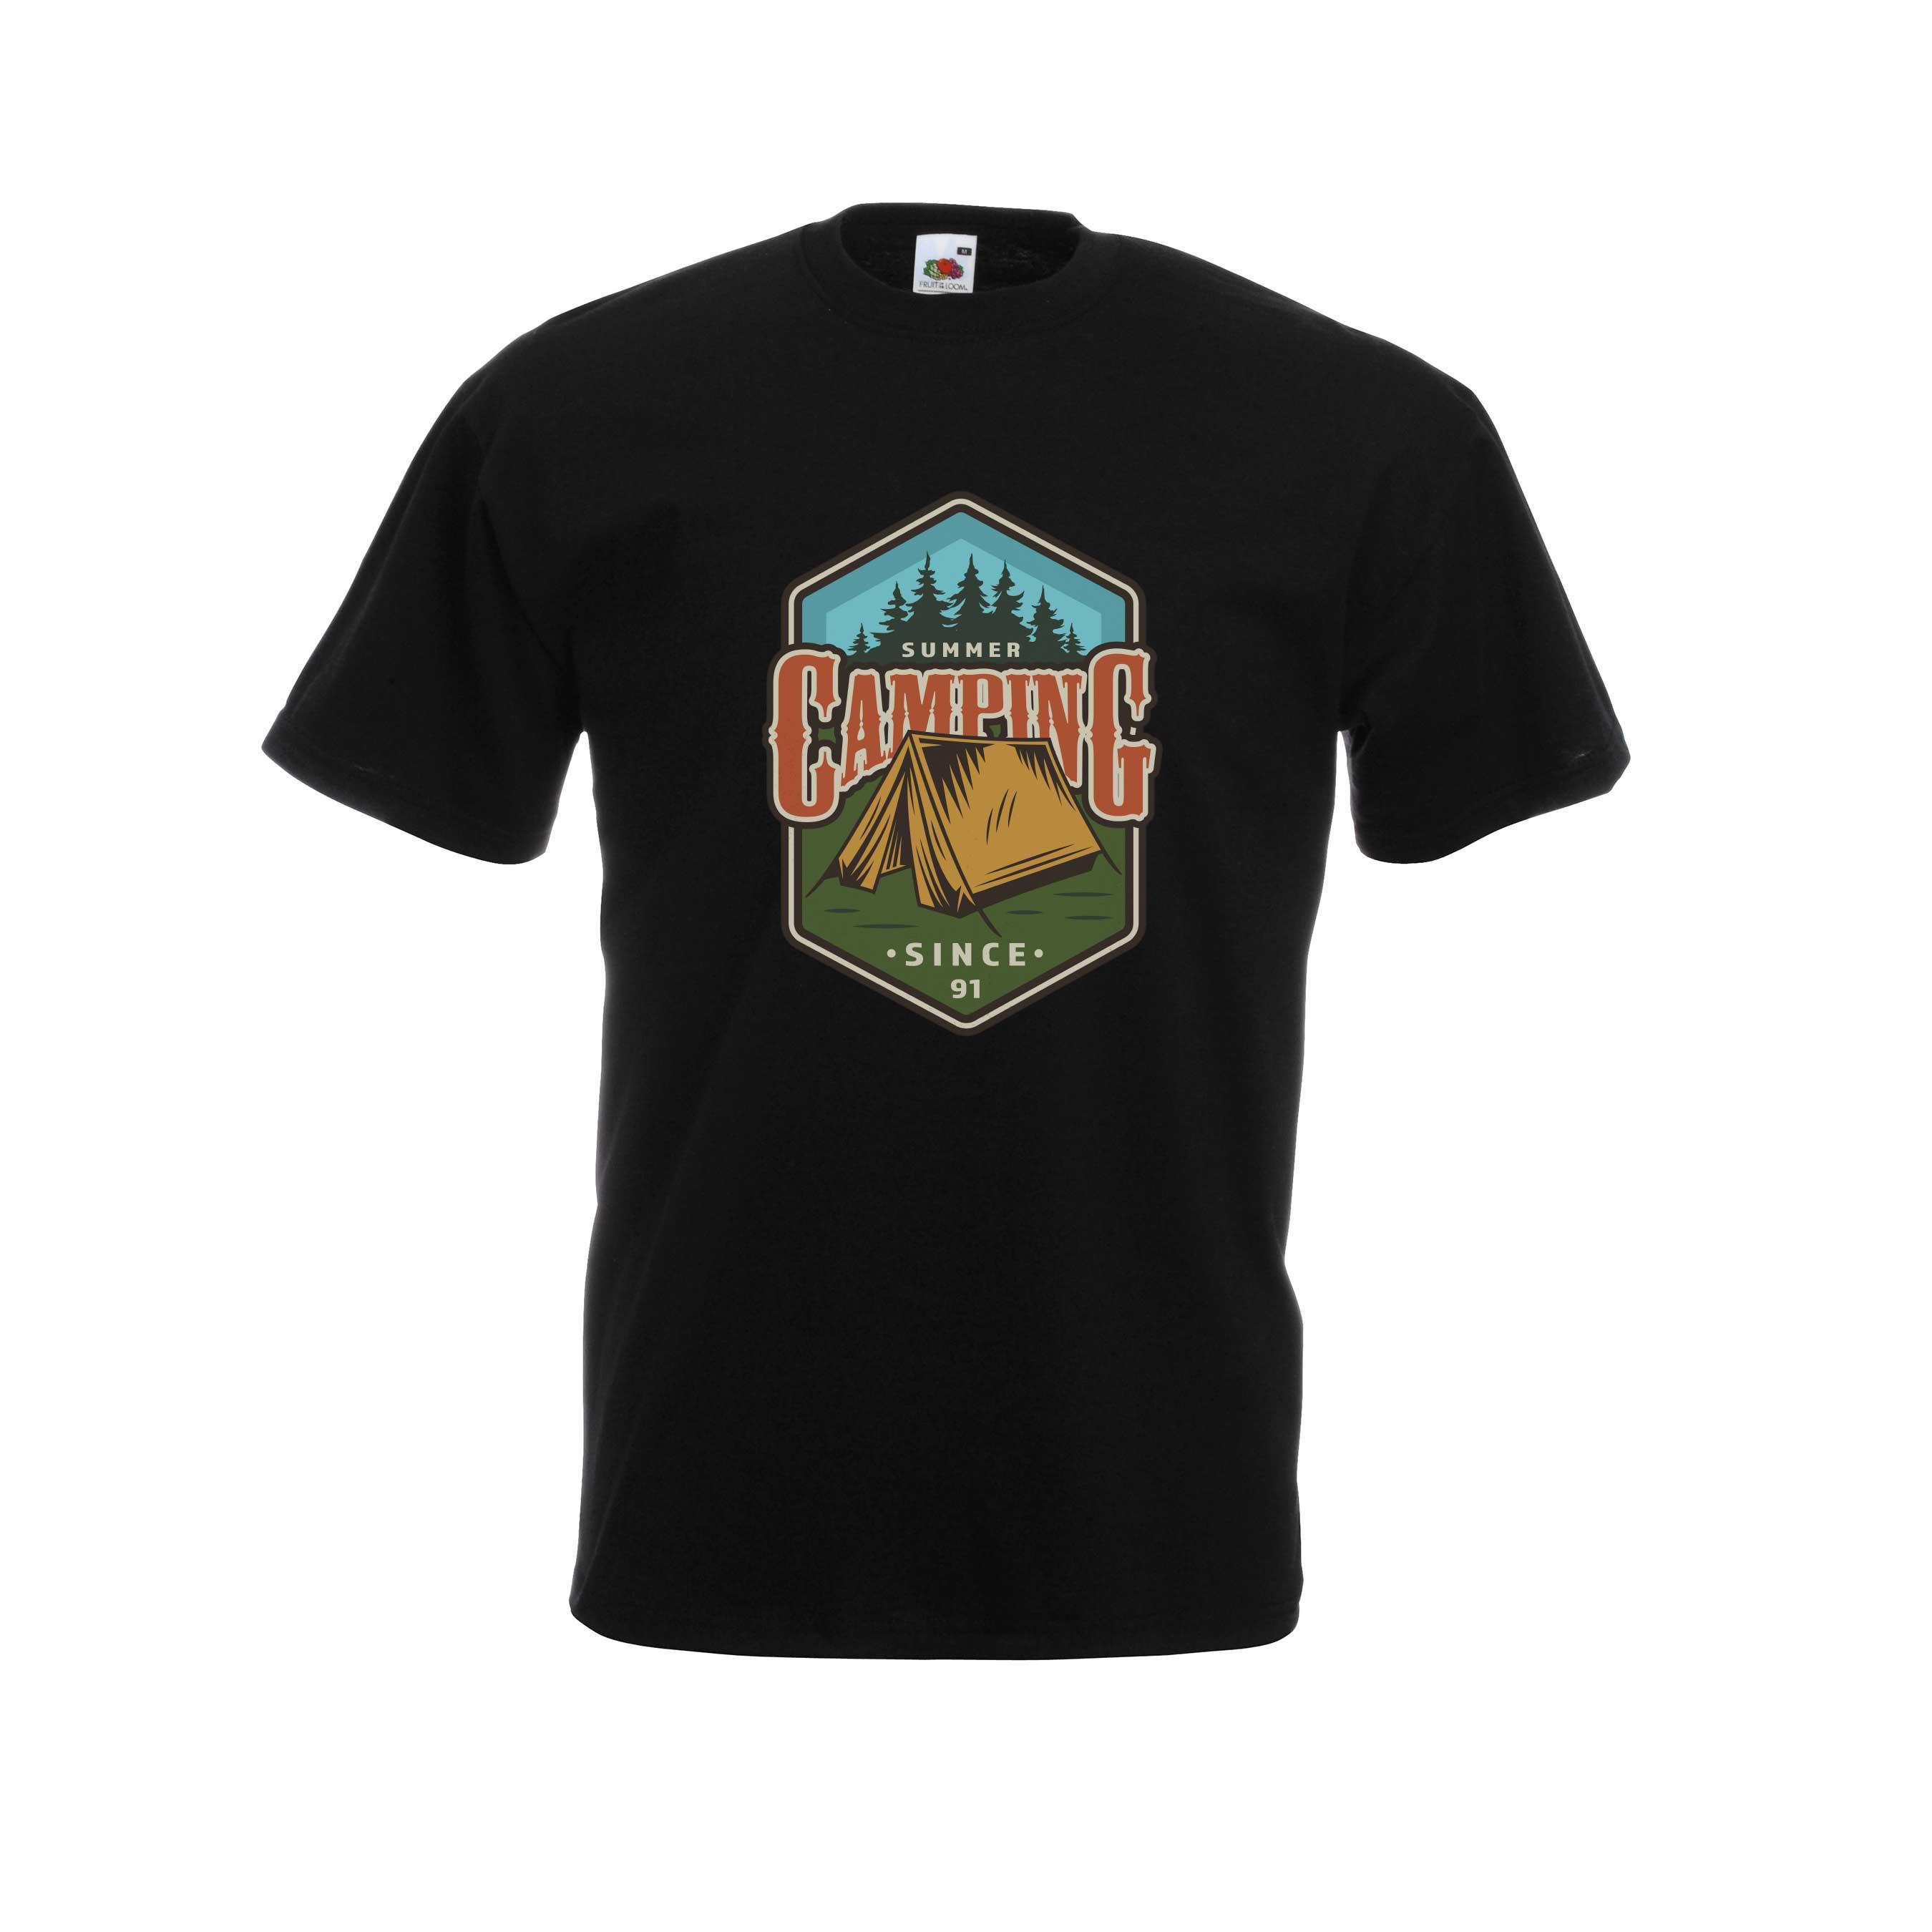 Camping design for t-shirt, hoodie & sweatshirt